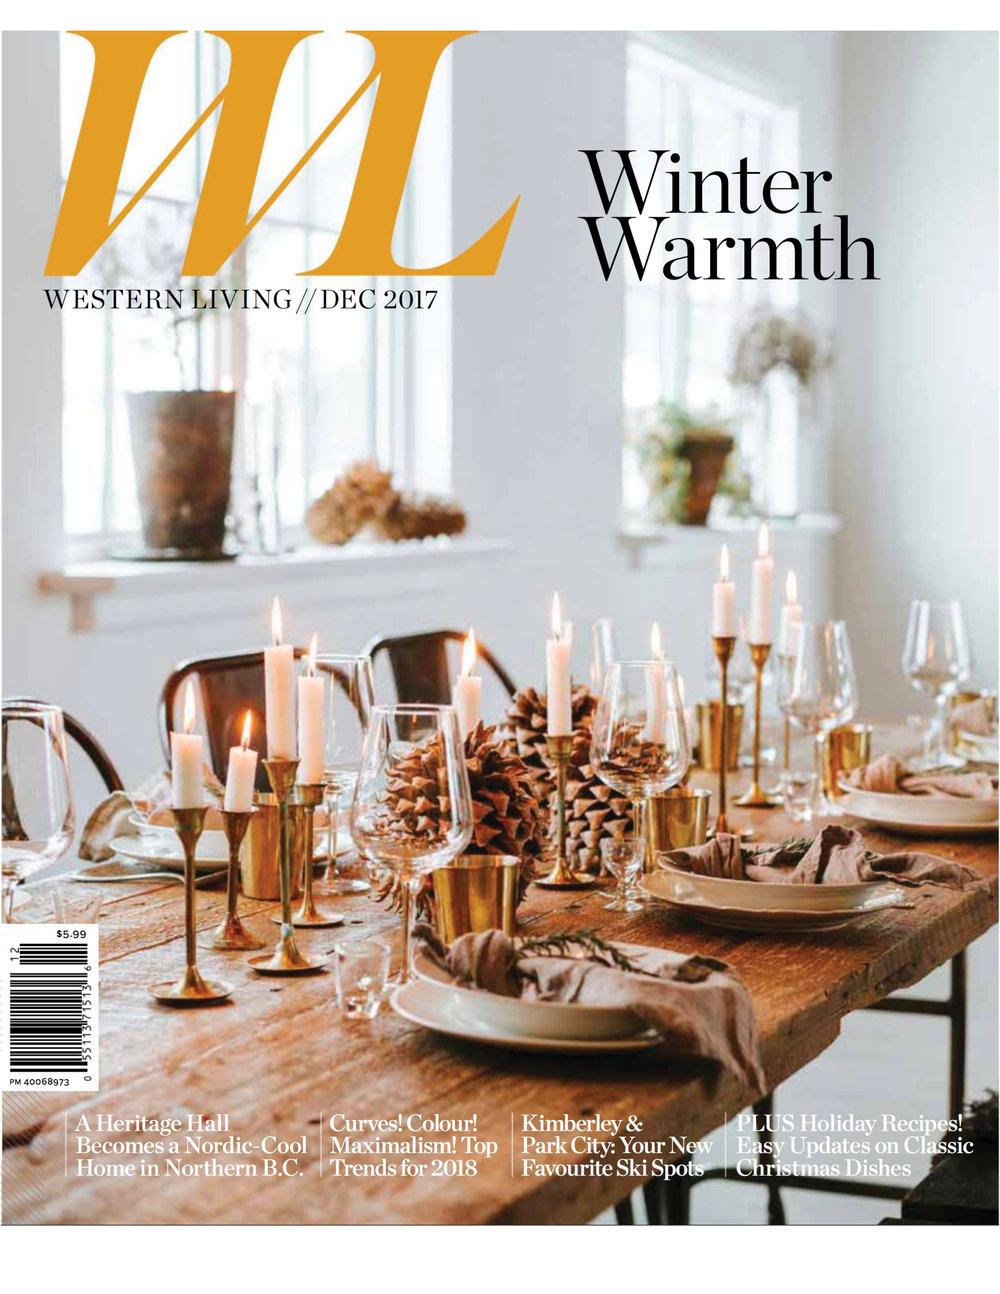 Western Living December 2017